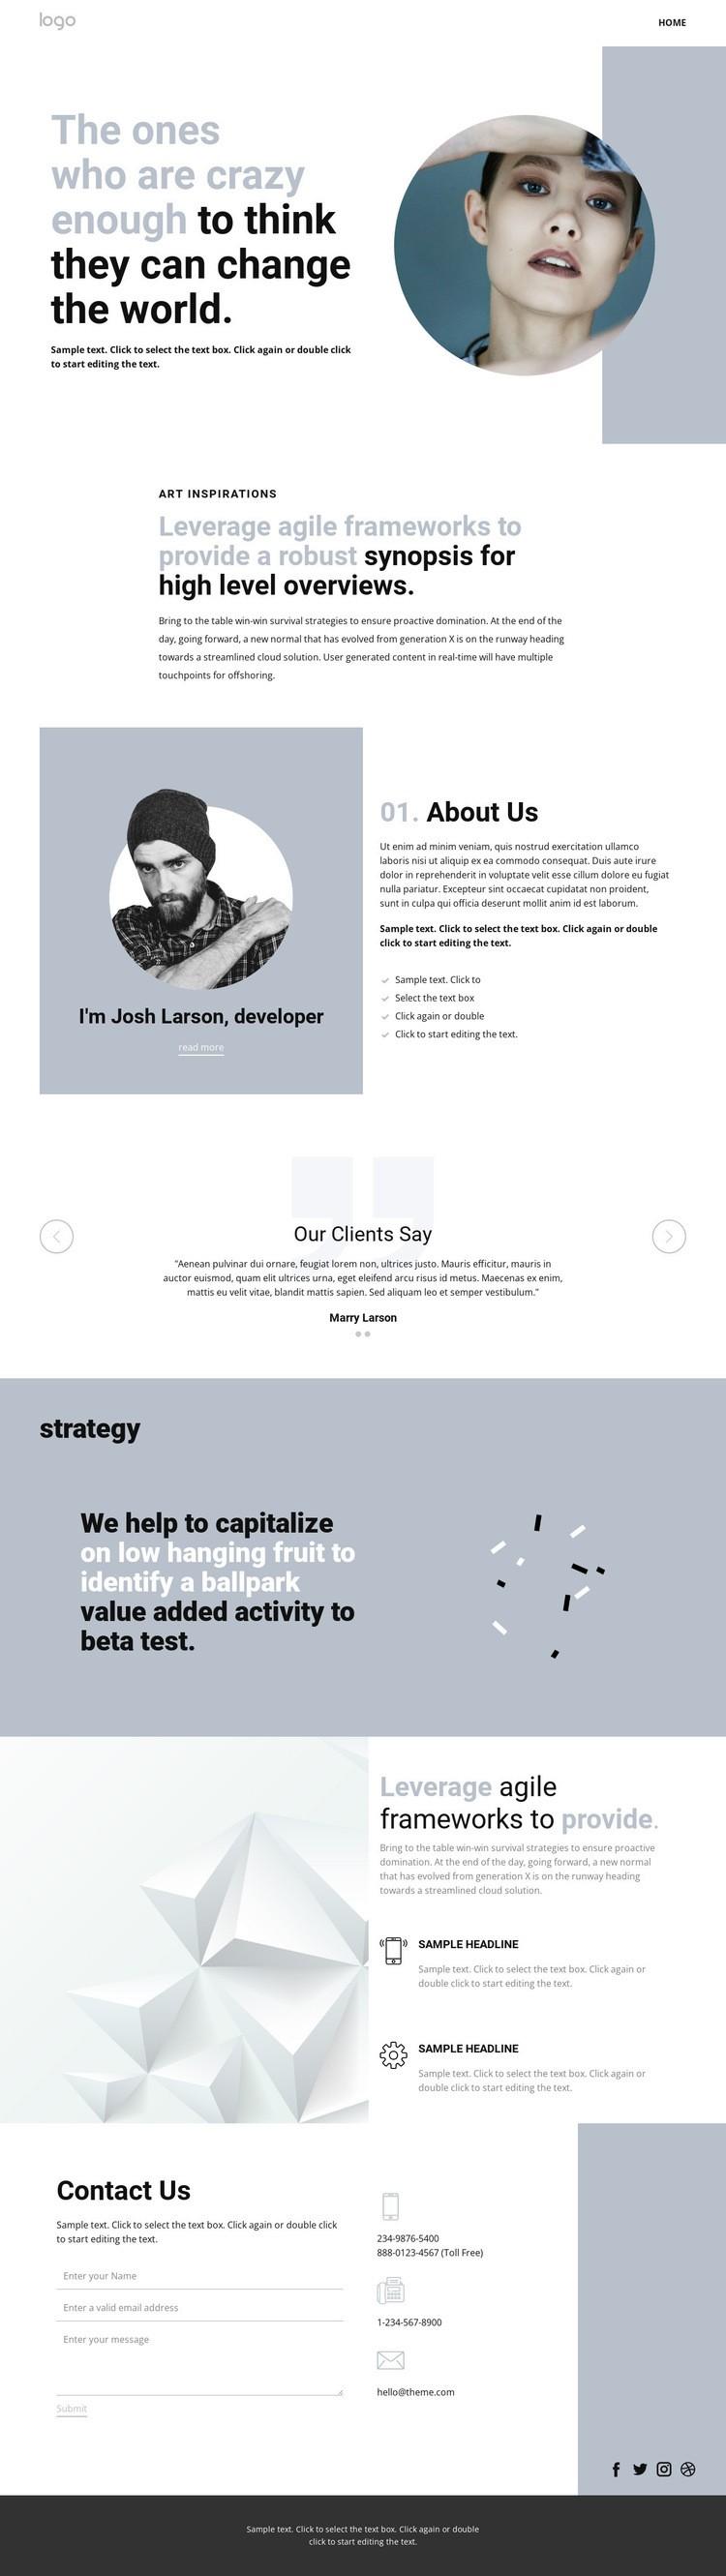 Creative studio innovation art Html Code Example